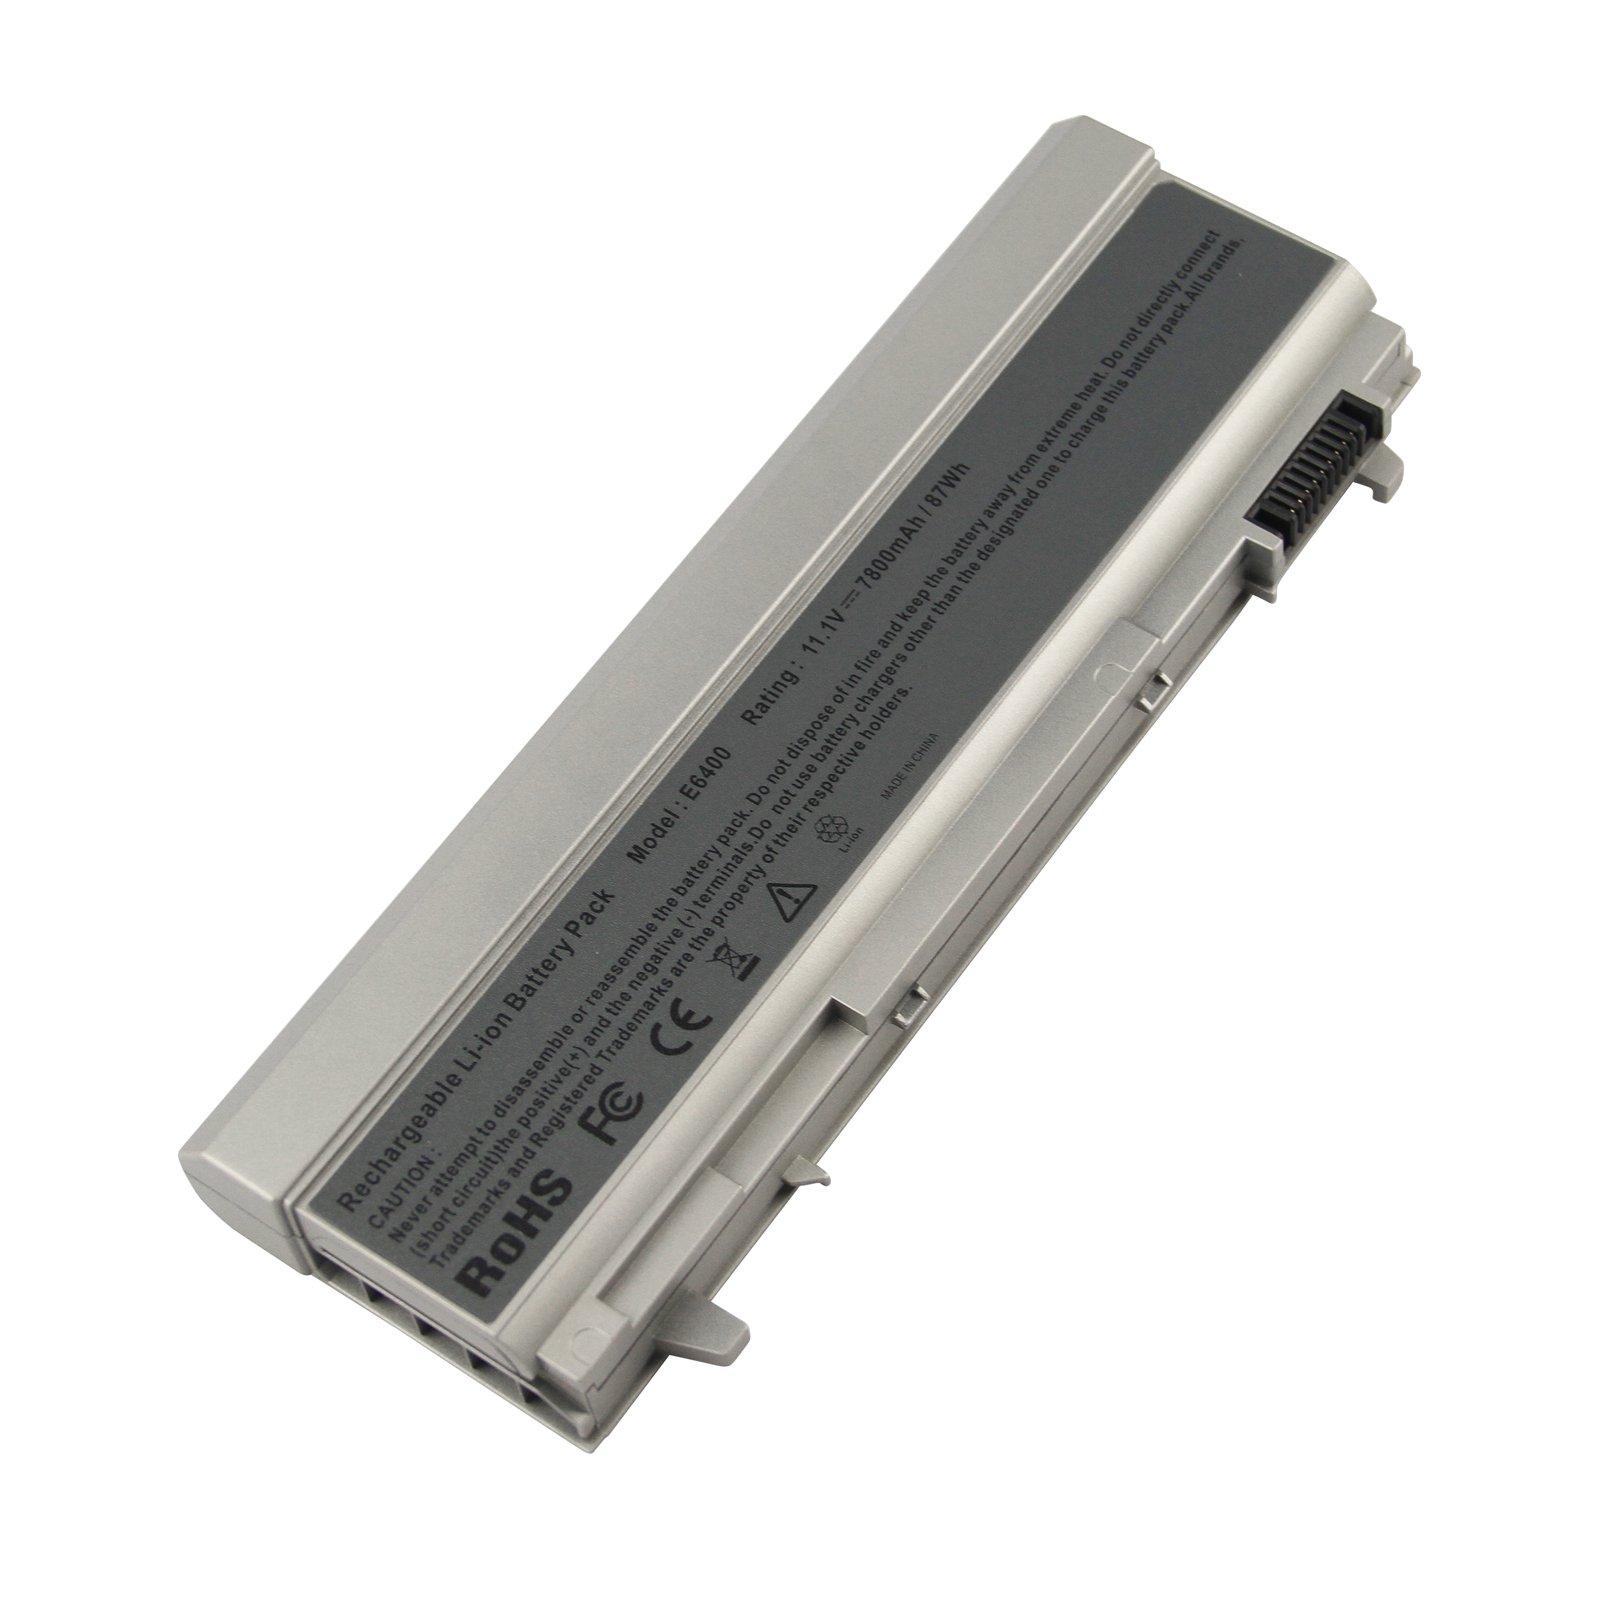 Bateria 9 Celdas 7800mAh para Dell Latitude E6400 E6410 E6500 E6510 Precision M2400 M4400 M4500 PN 312-0748 312-0749 312